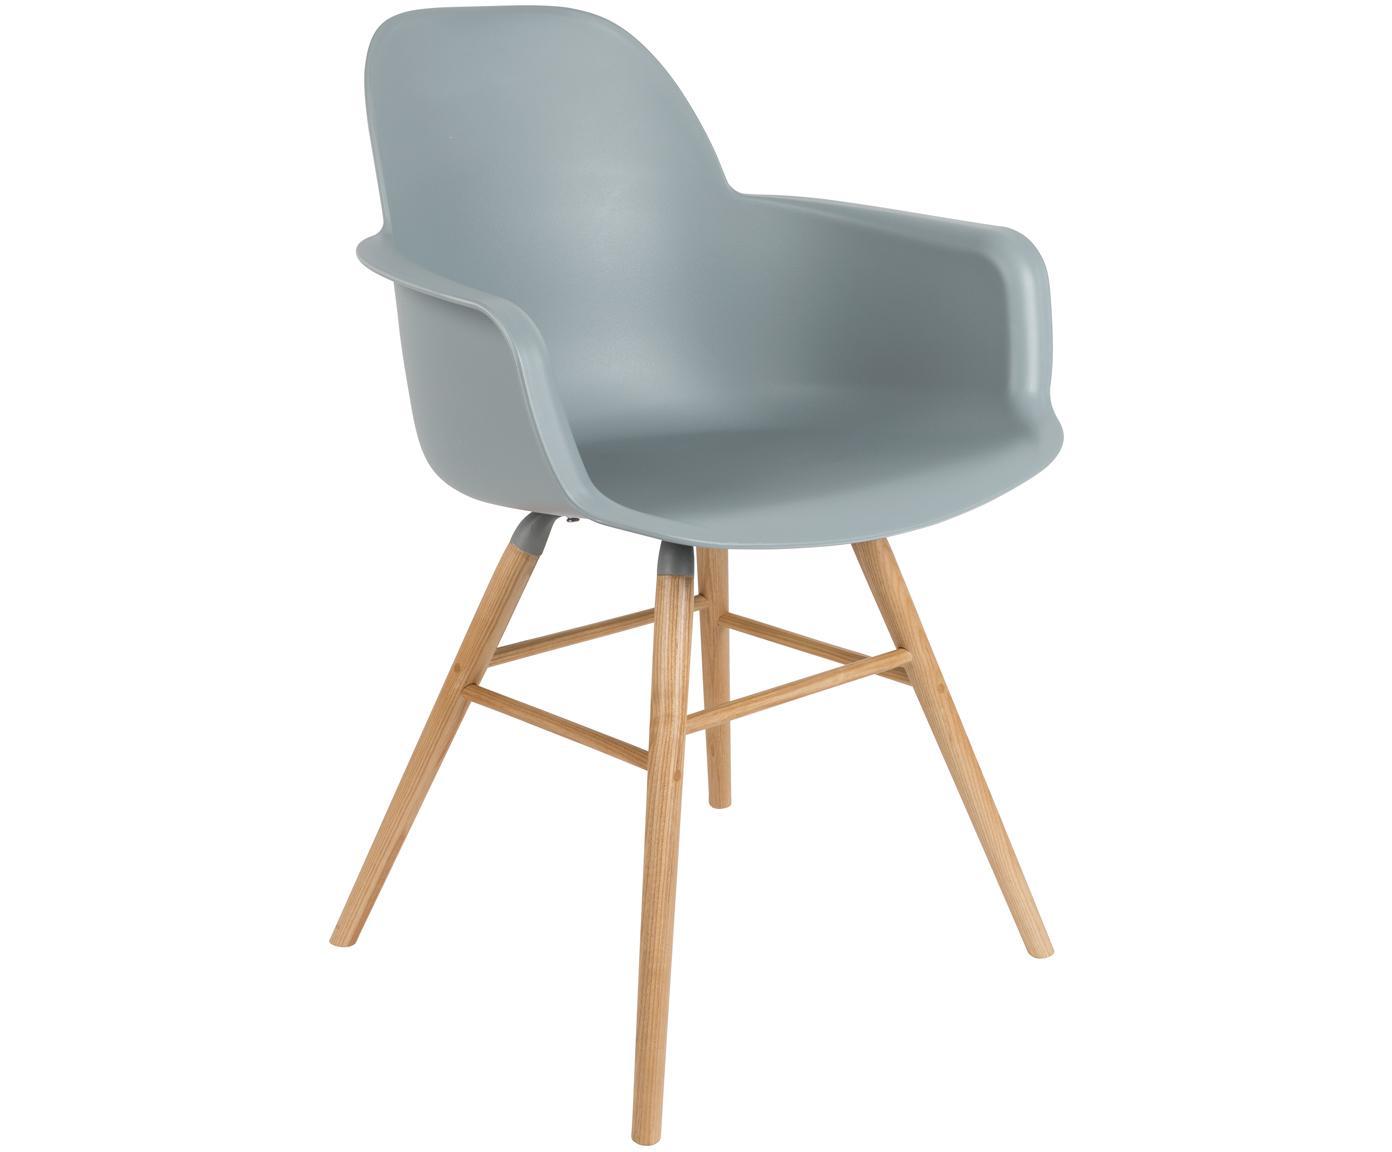 Sedia con braccioli Albert Kuip, Seduta: 100% polipropilene, Piedini: legno di frassino, Grigio, Larg. 59 x Prof. 55 cm